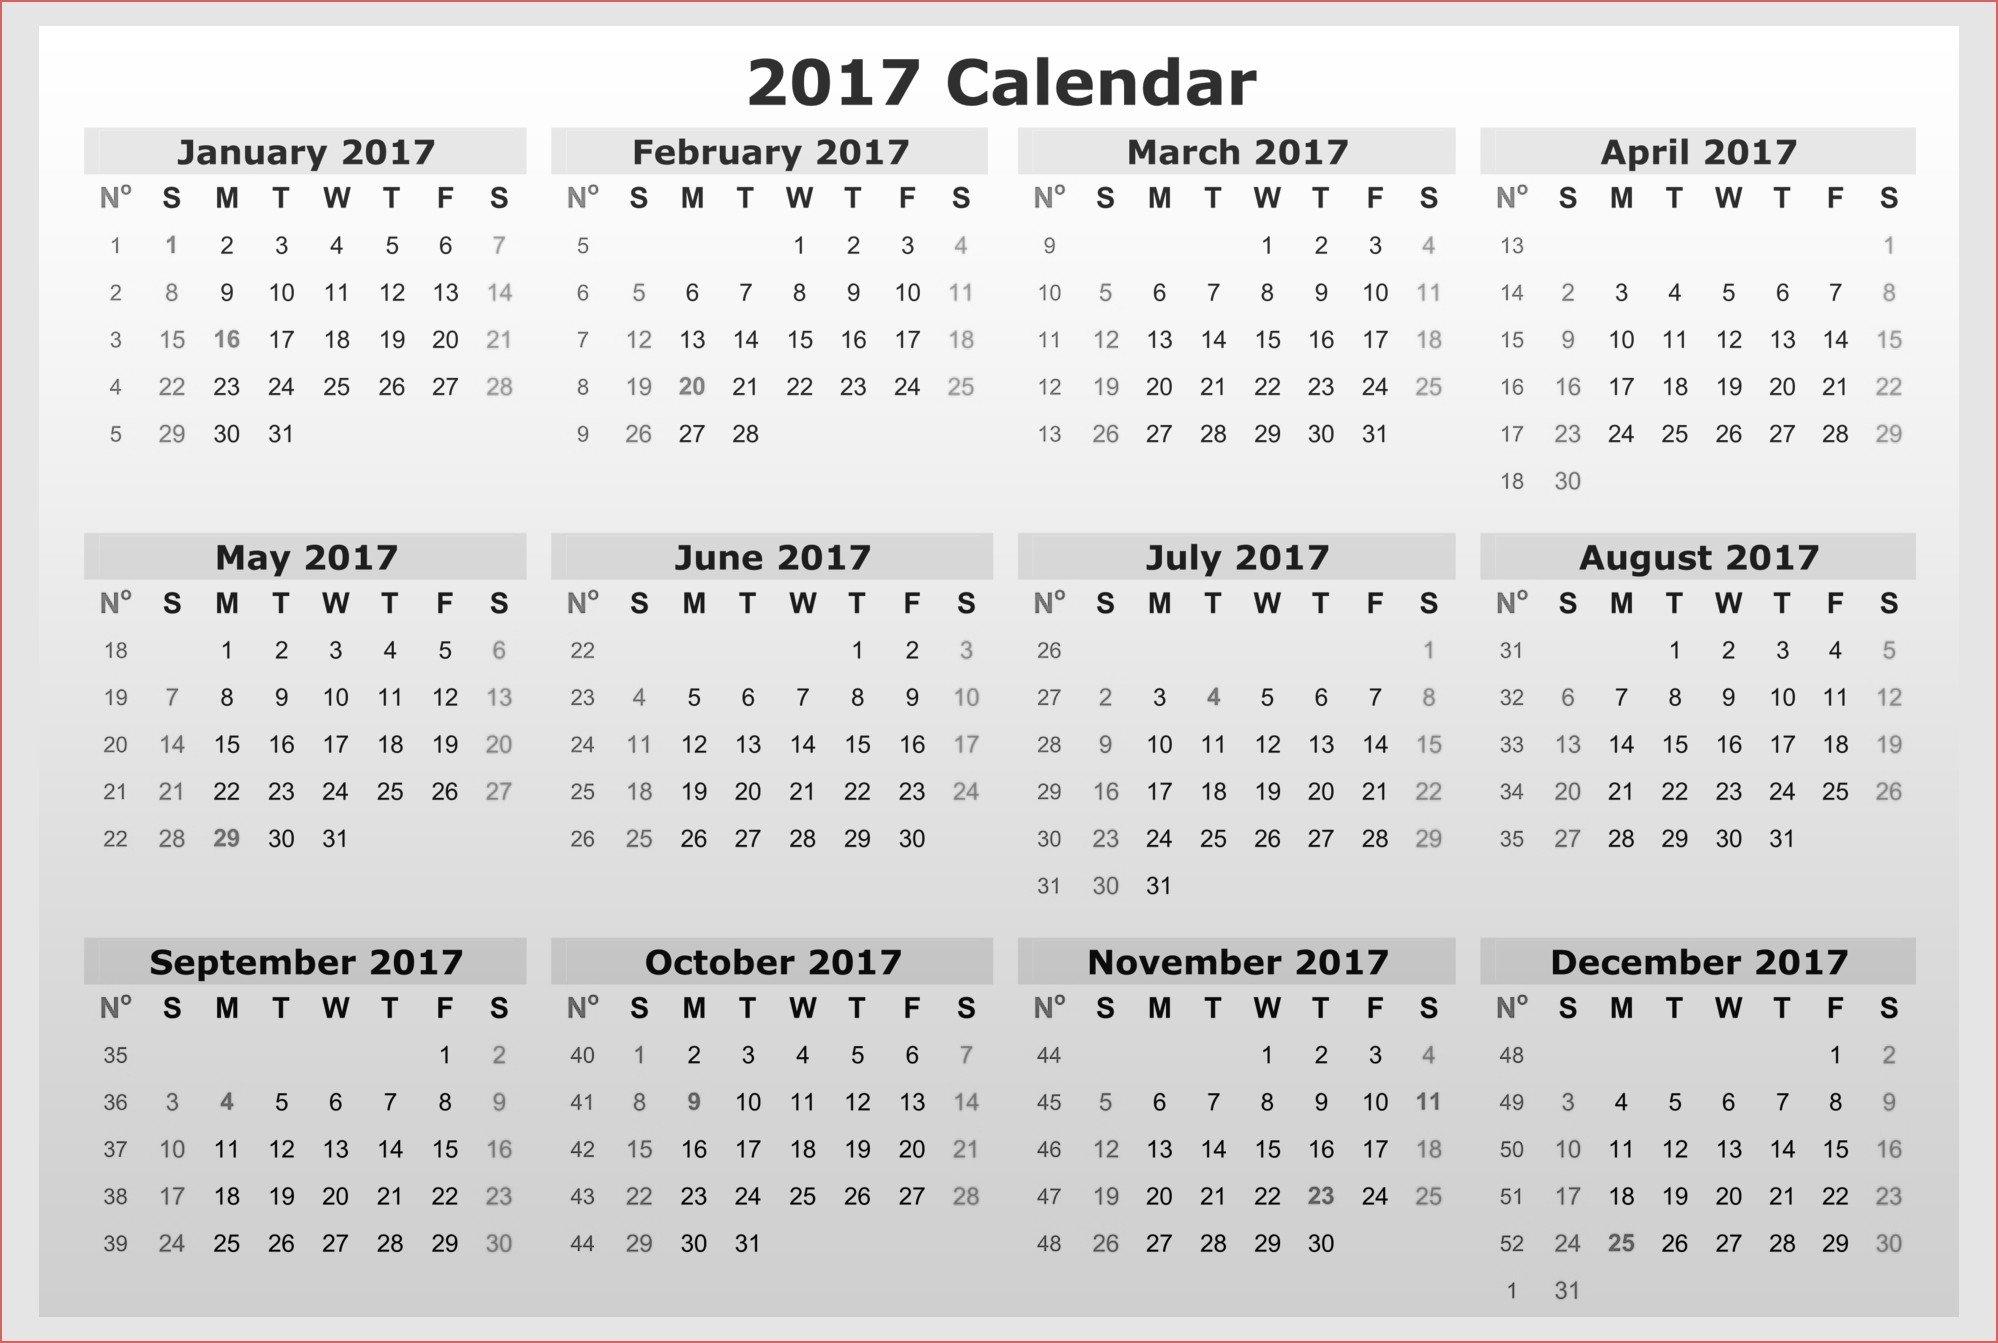 Large Printable Numbers 1 31 - Calendar Inspiration Design Printable Numbers 1 - 31